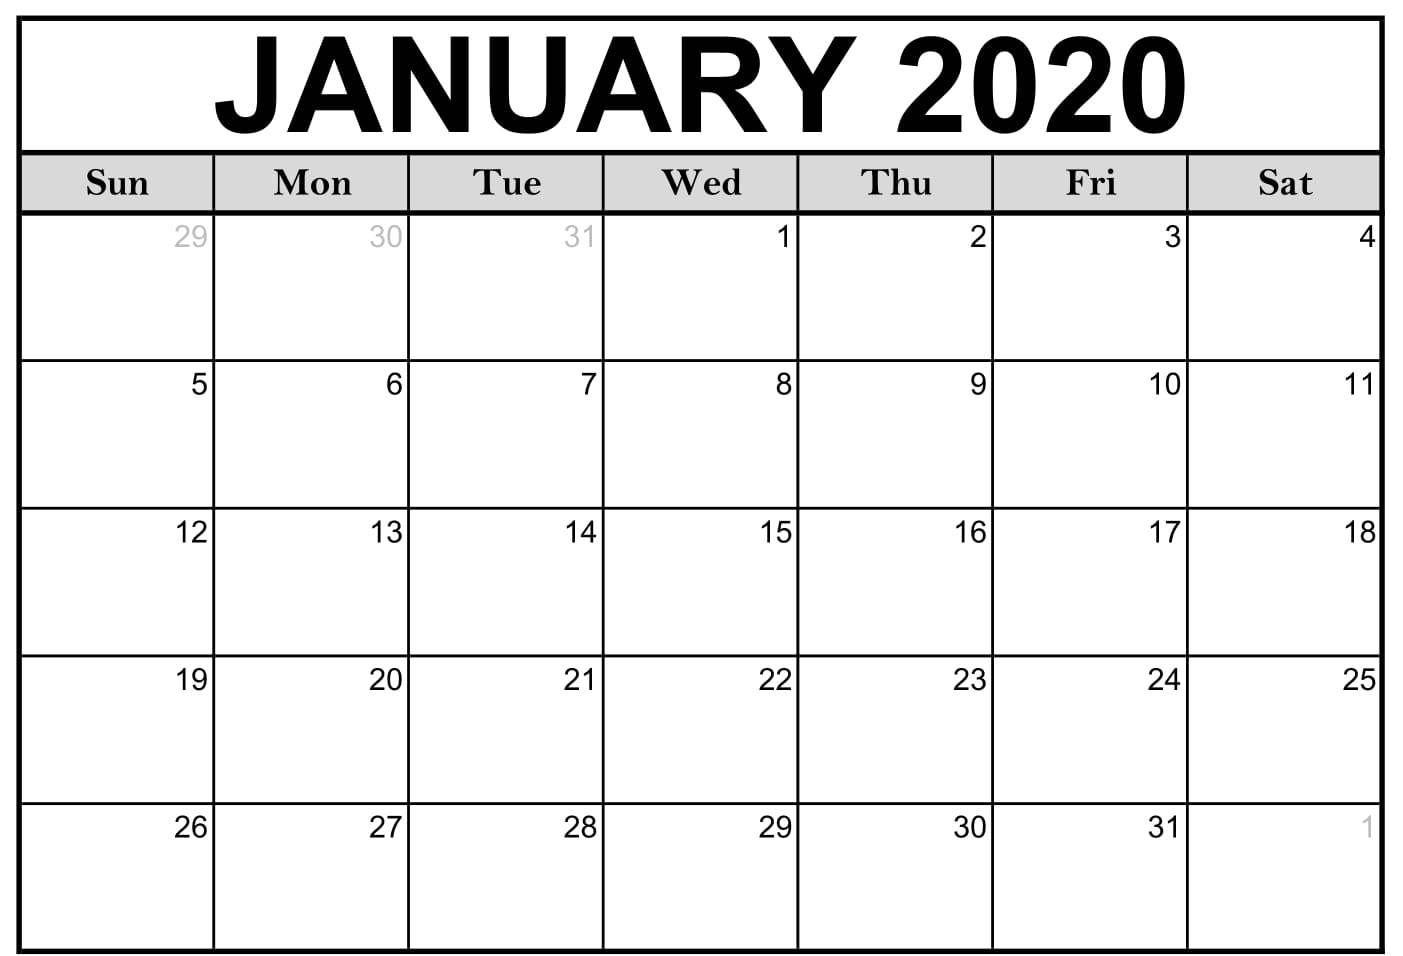 January 2020 Calendar Template | Printable Calendar Template